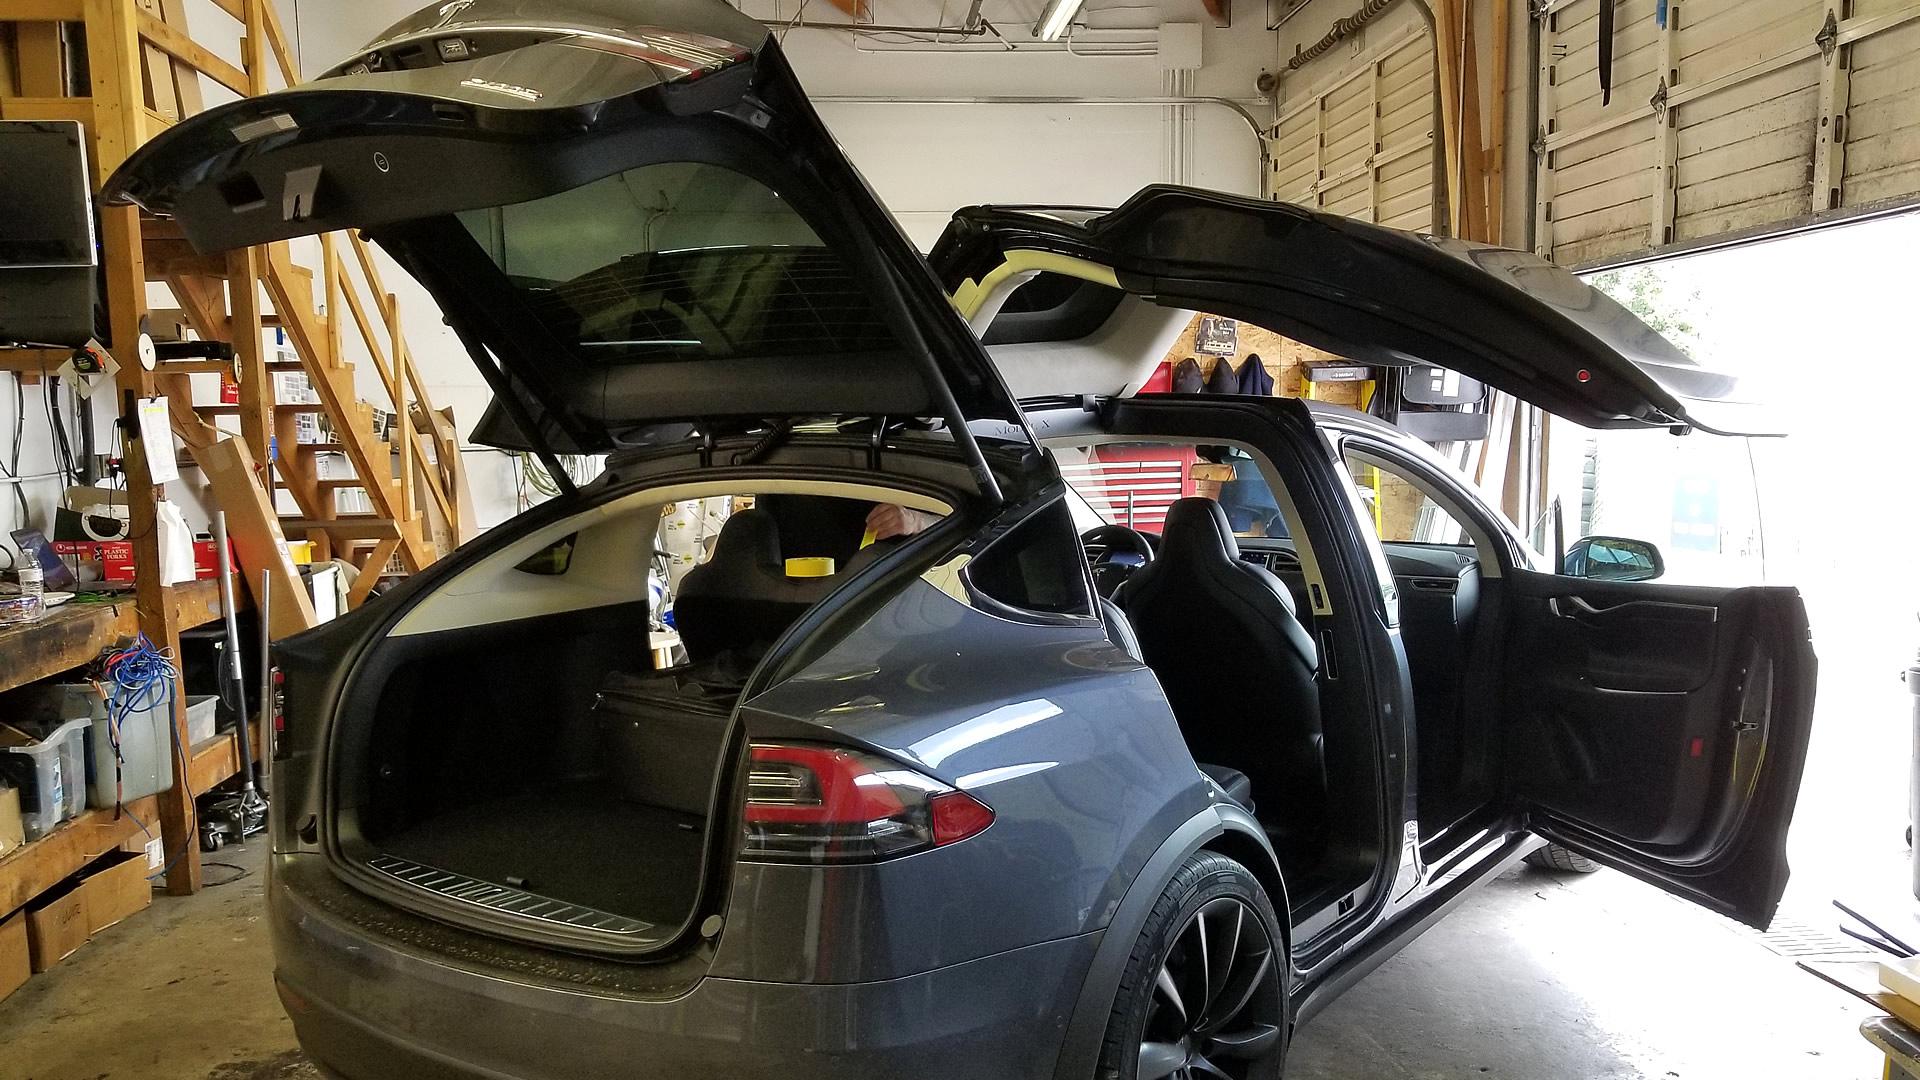 Car detailing in Lynnwood